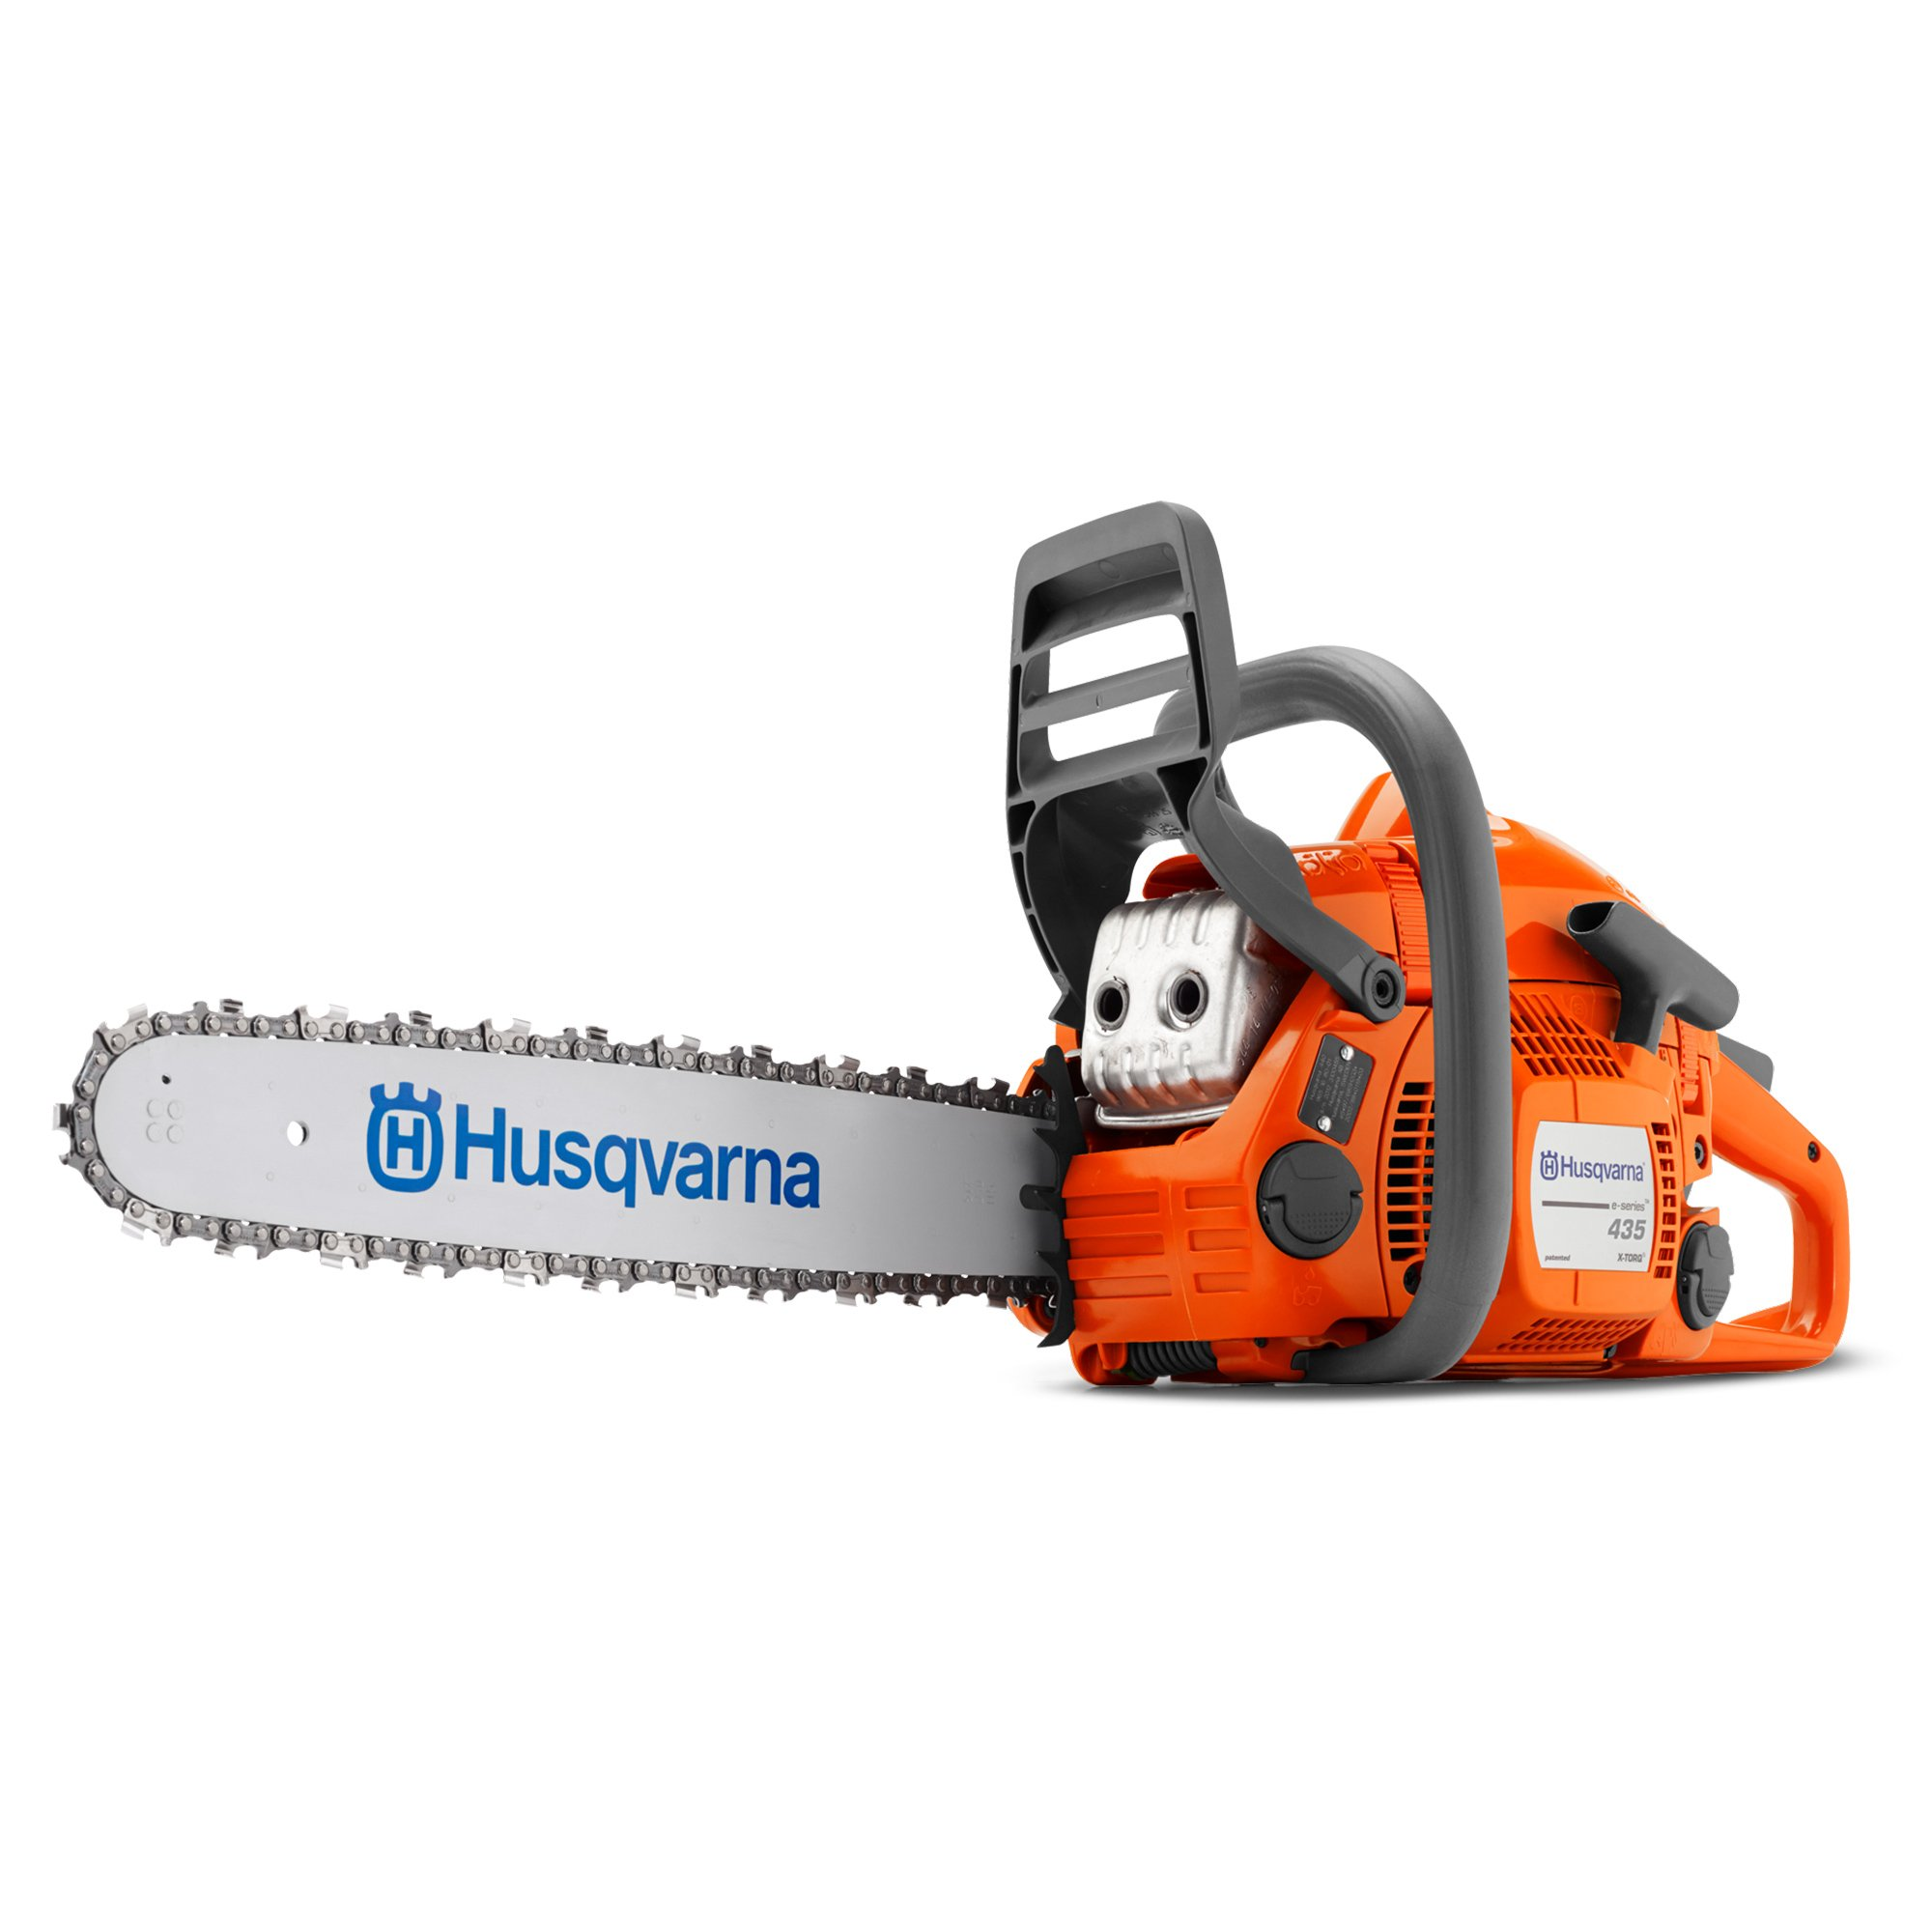 Husqvarna 435E 16'' 40.9cc 967650802 Gas-Powered Chain Saw